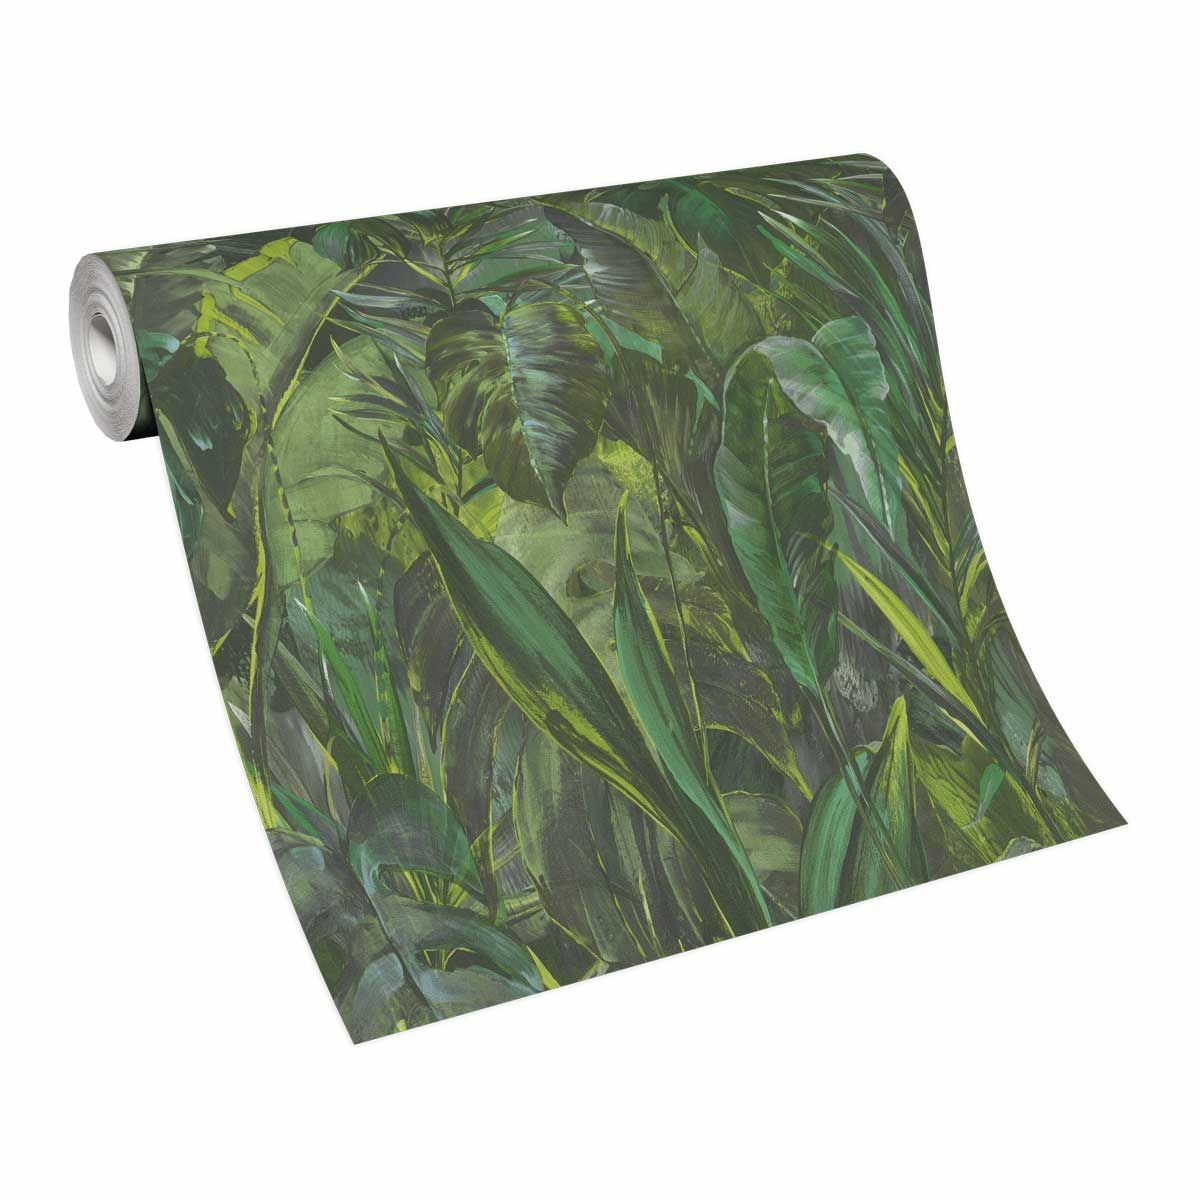 Papier peint vinyl intissé jungle vert citron Tralee